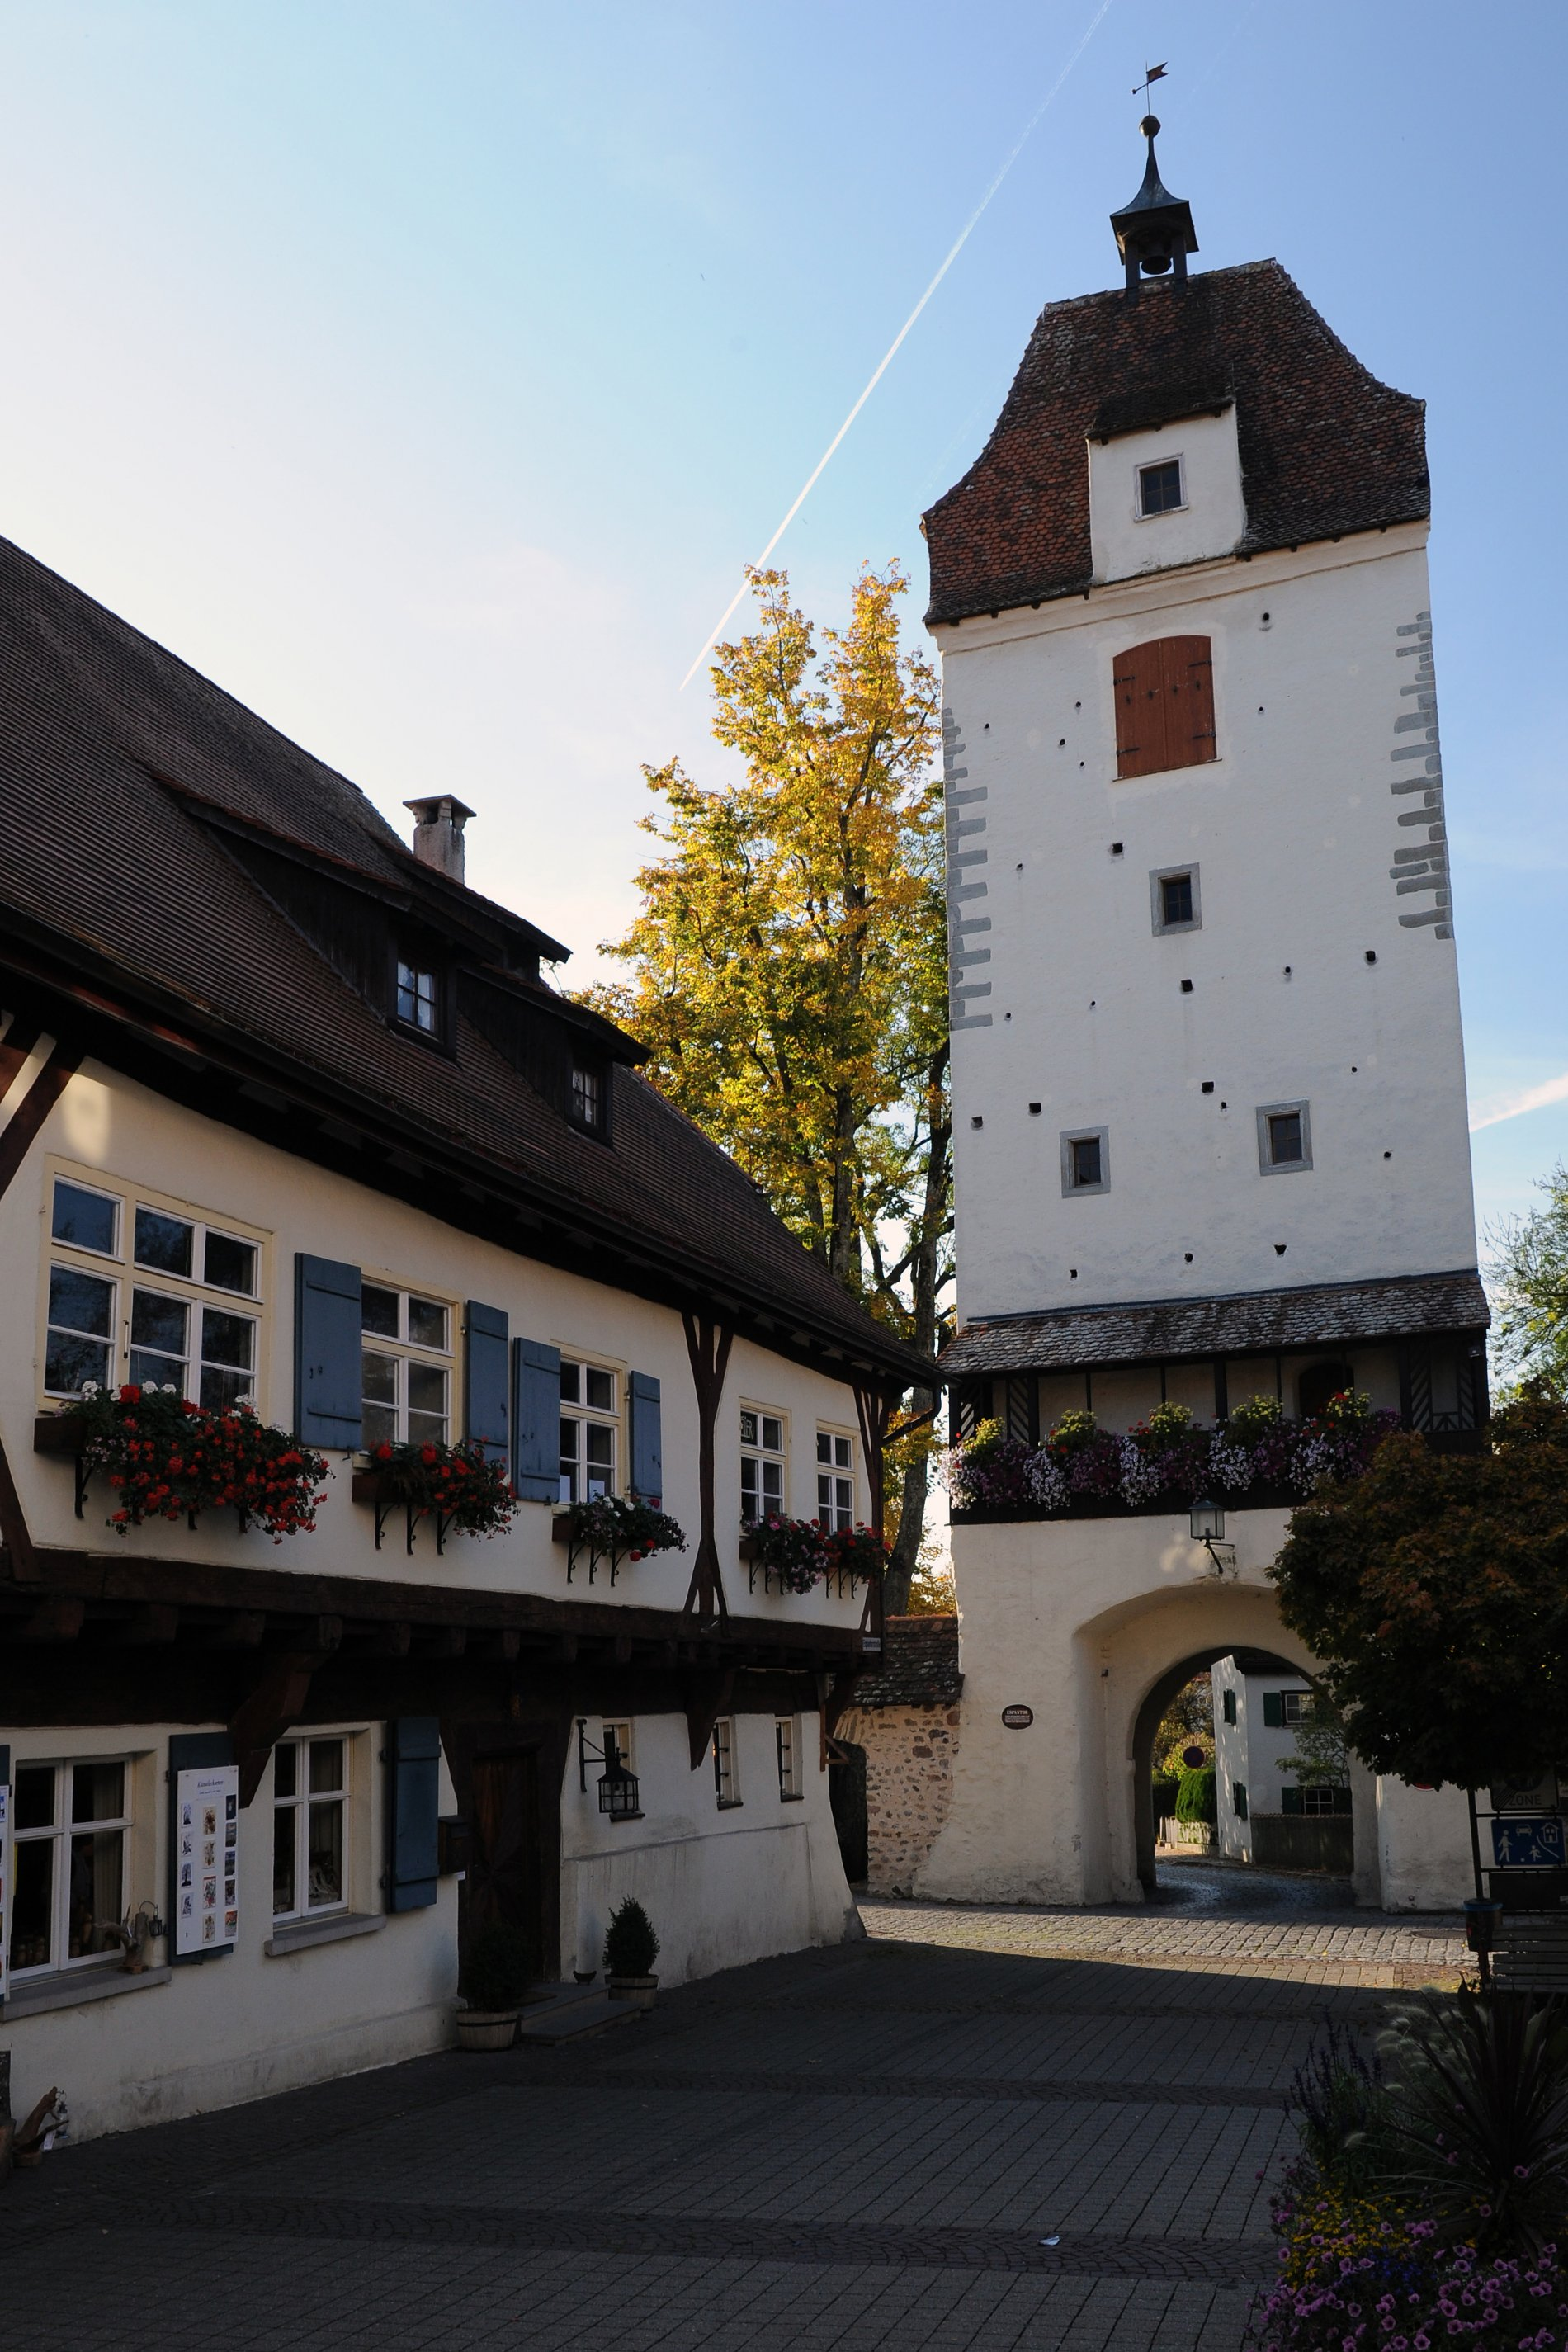 Espantor-Turm mit Städtischer Galerie in Isny